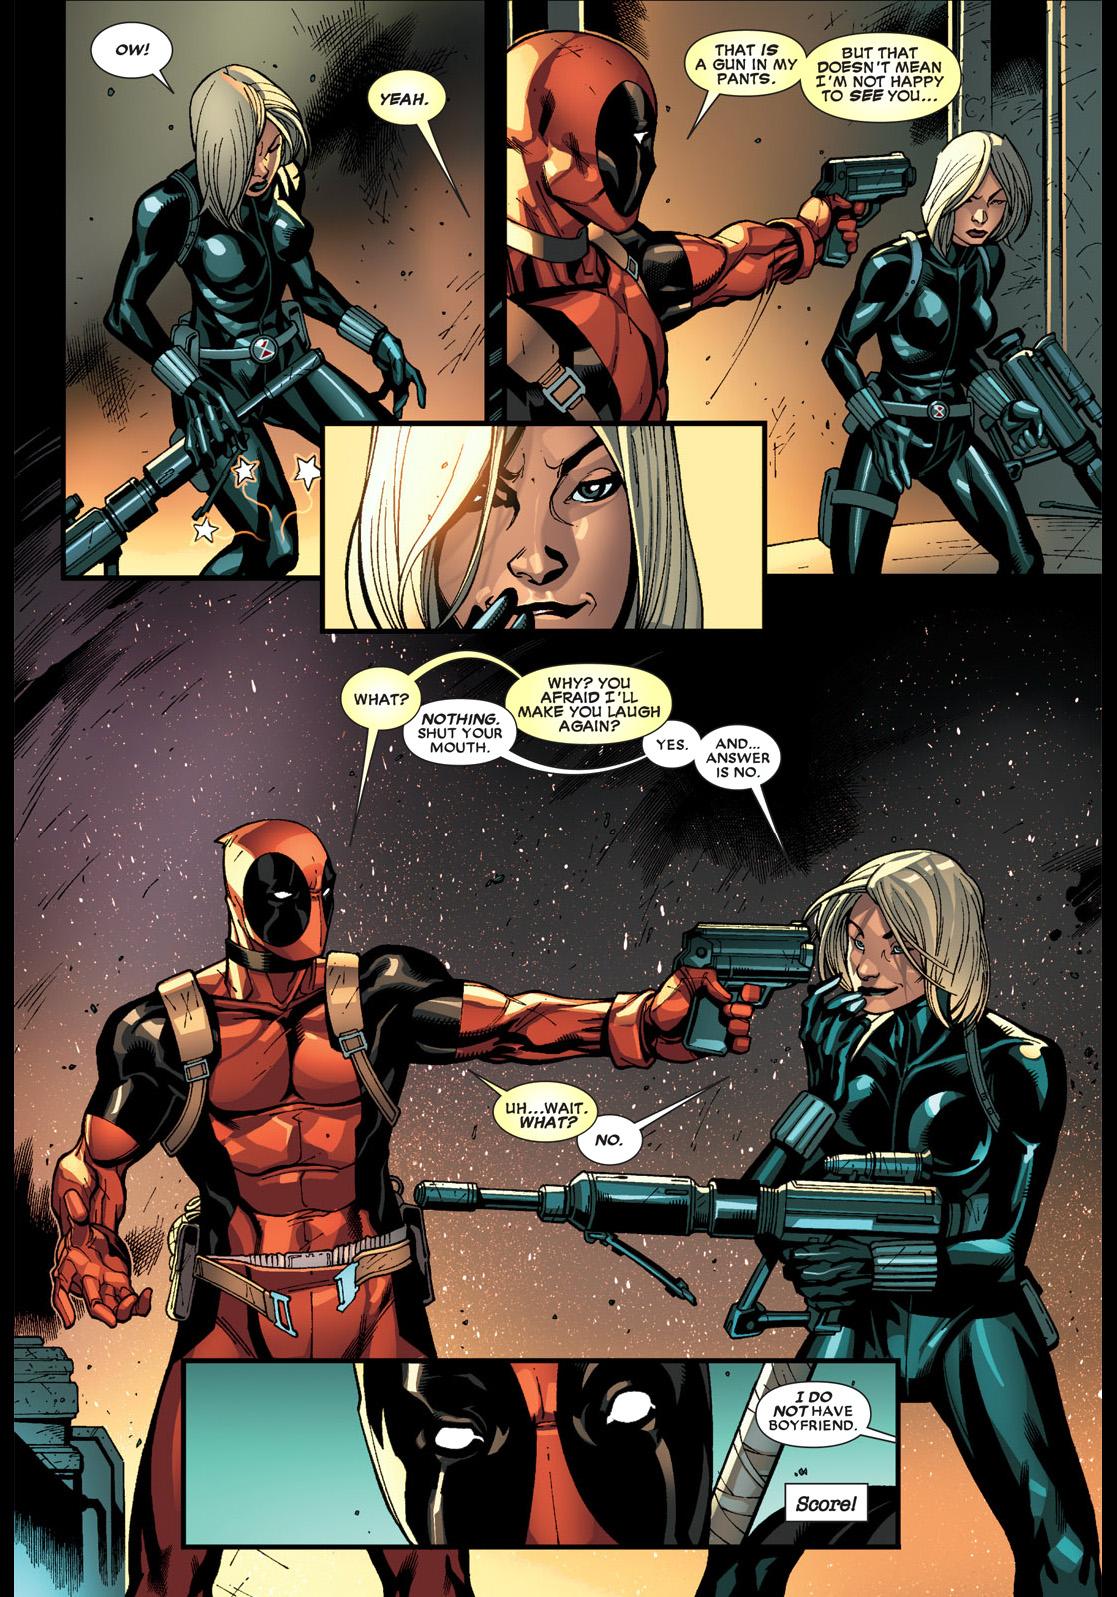 Deadpool Flirts With Black Widow Comicnewbies